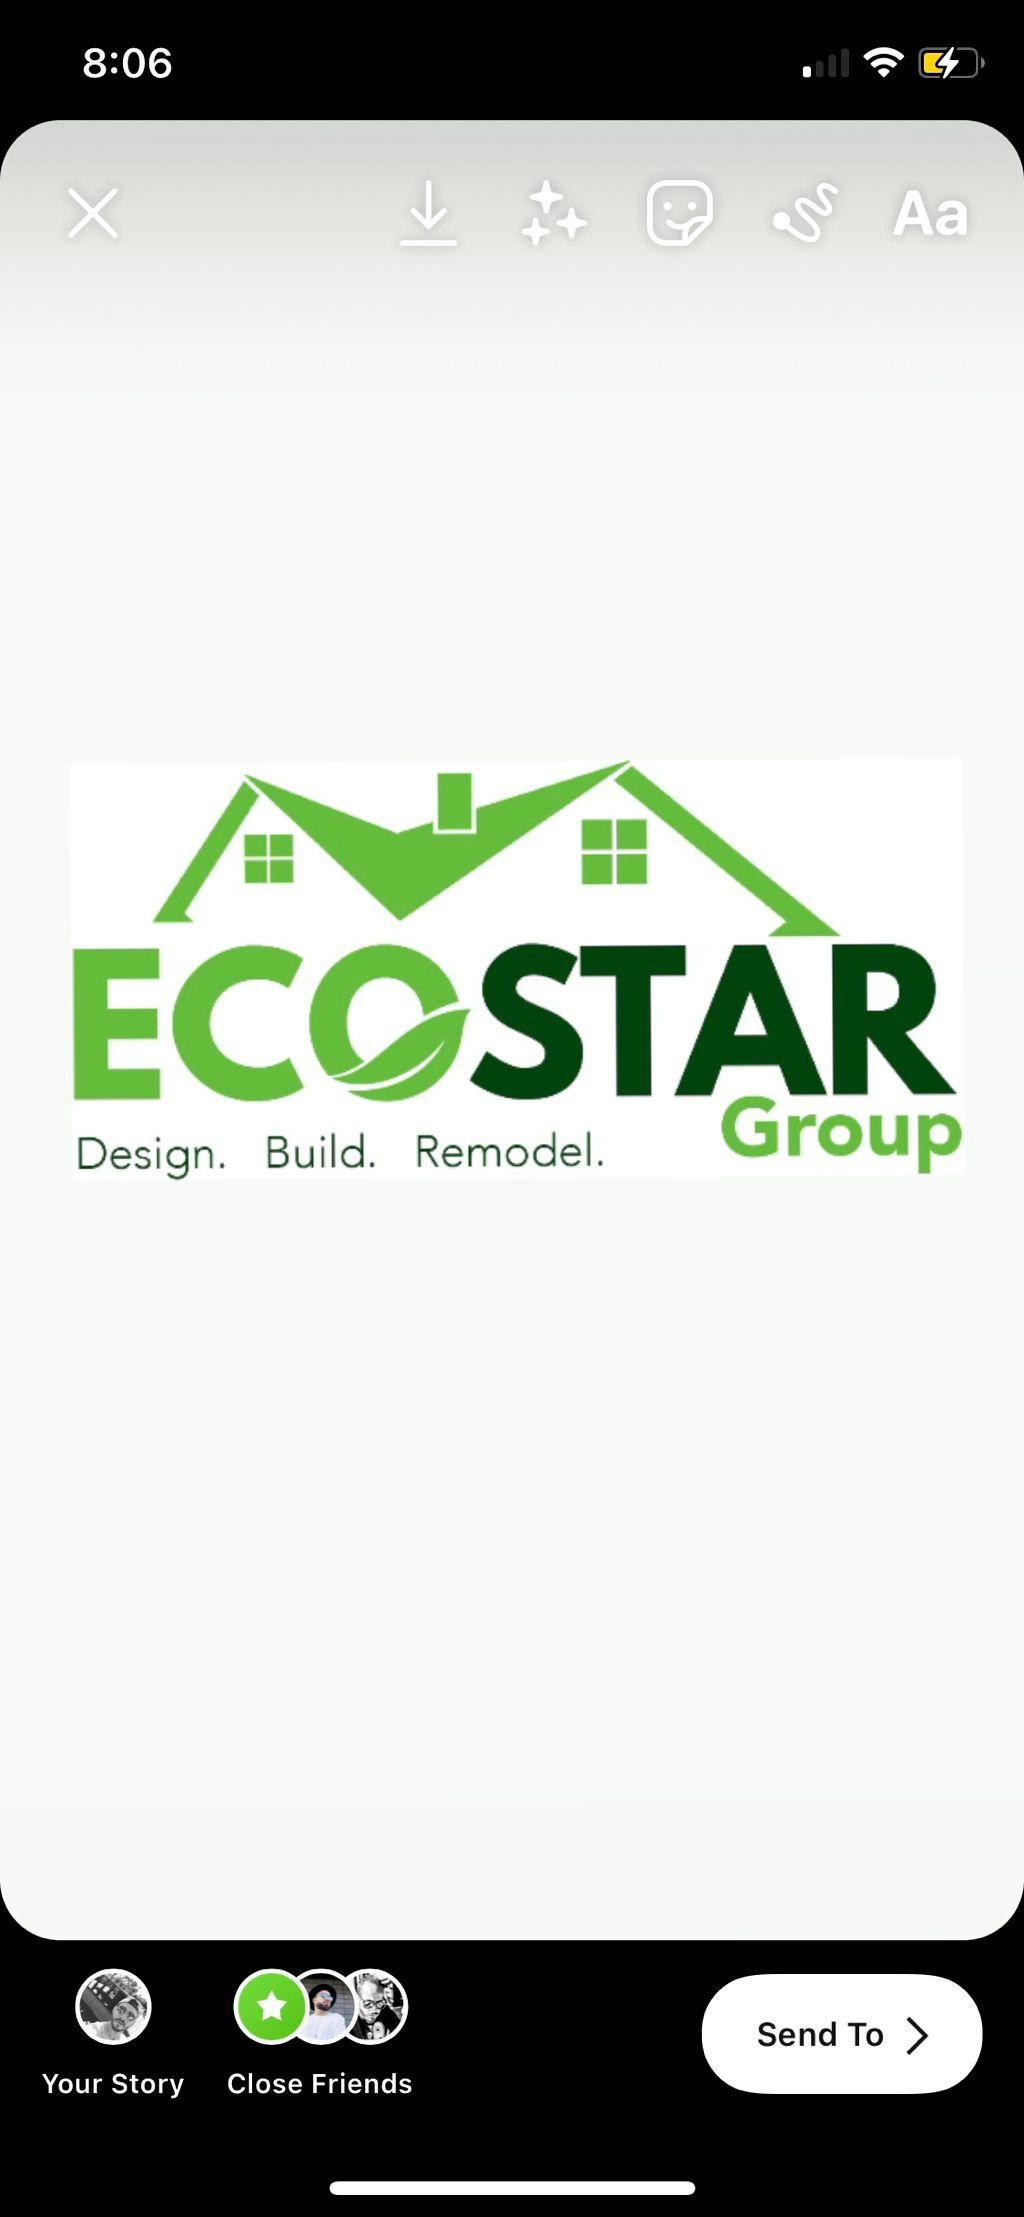 Ecostar group construction